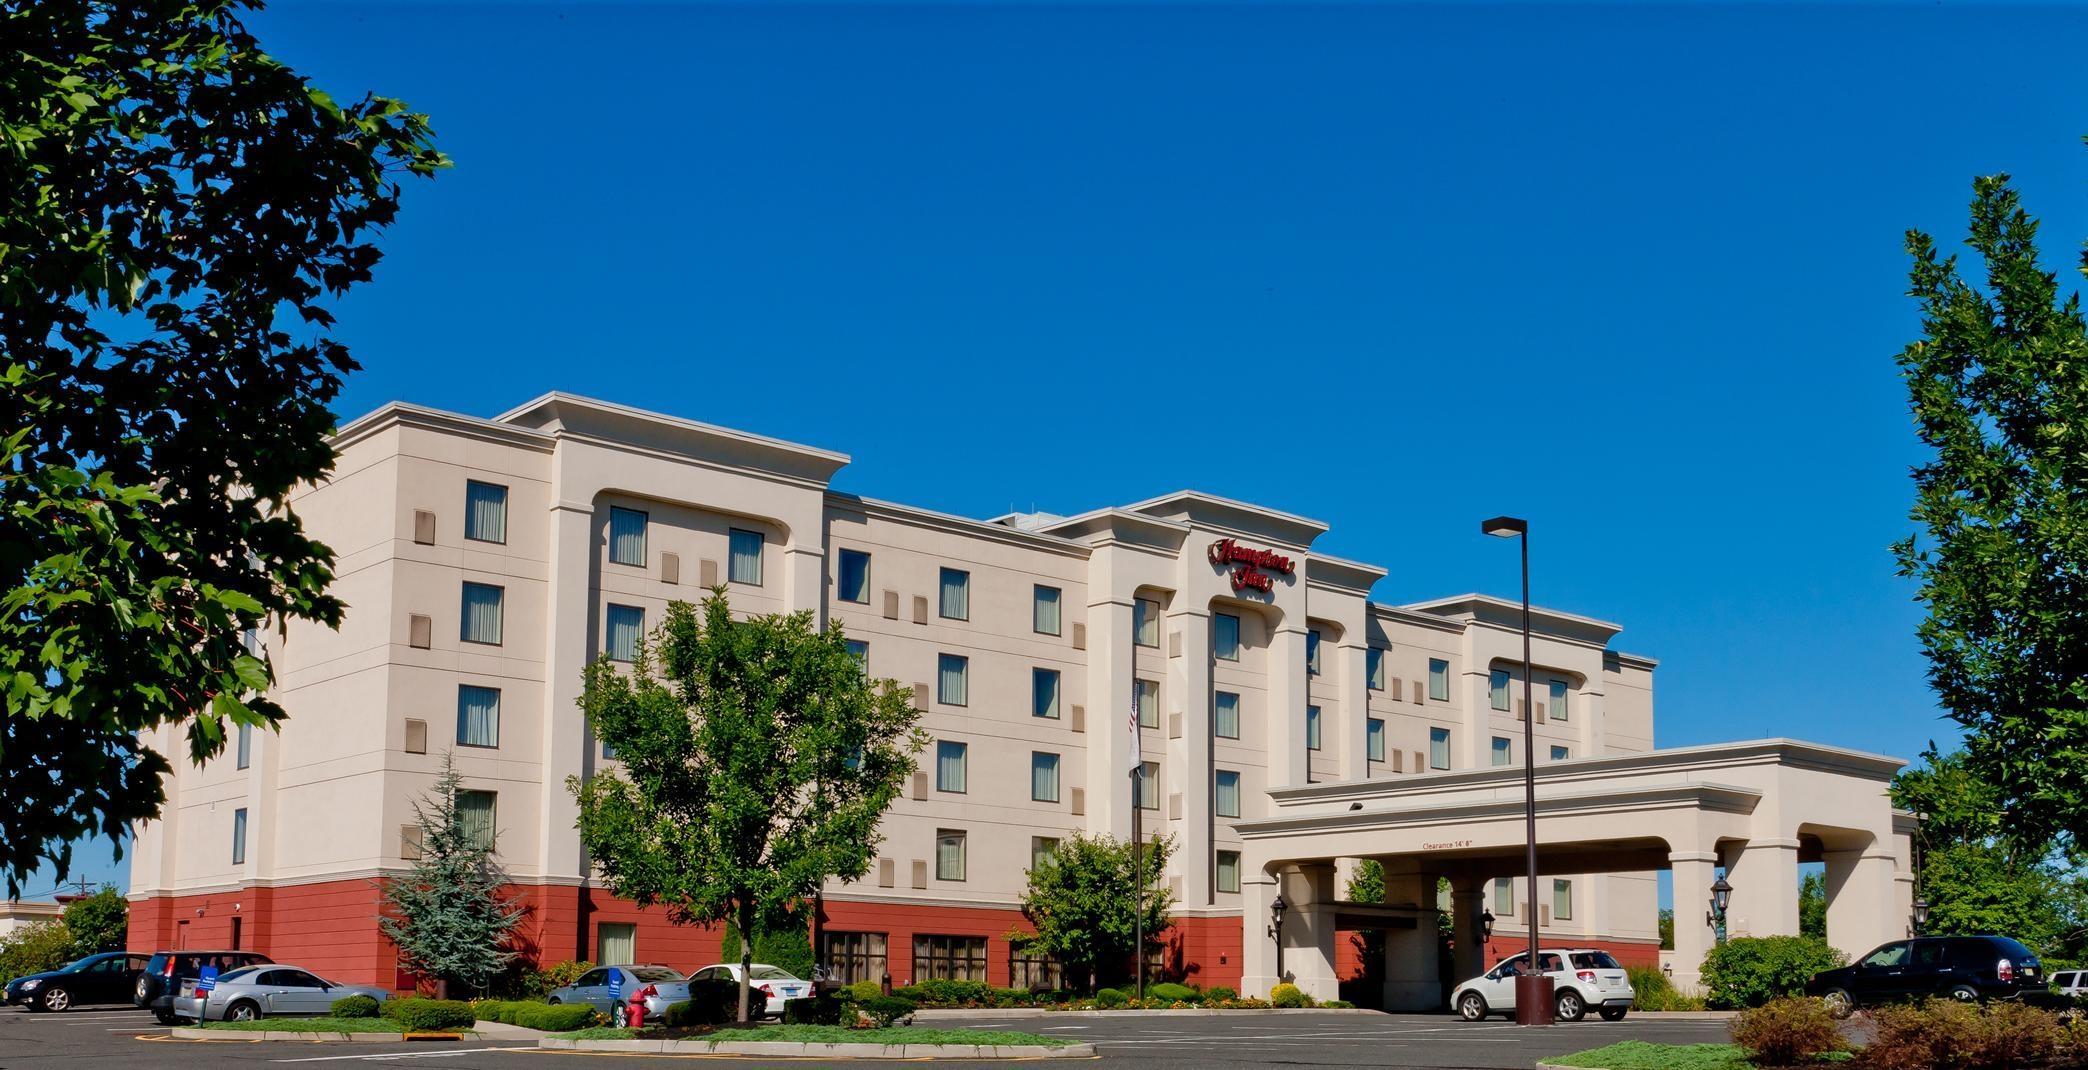 Motel  South Plainfield Nj